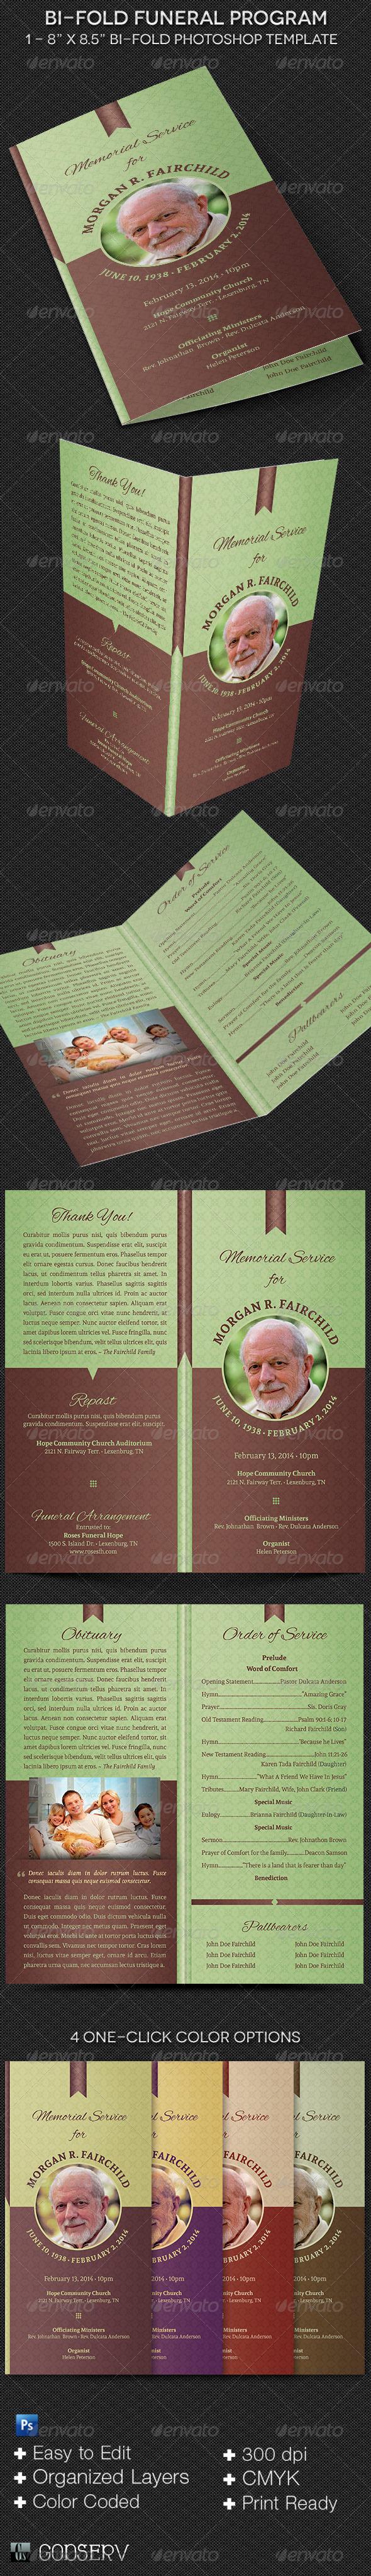 GraphicRiver Bi-fold Funeral Program Template 7039973